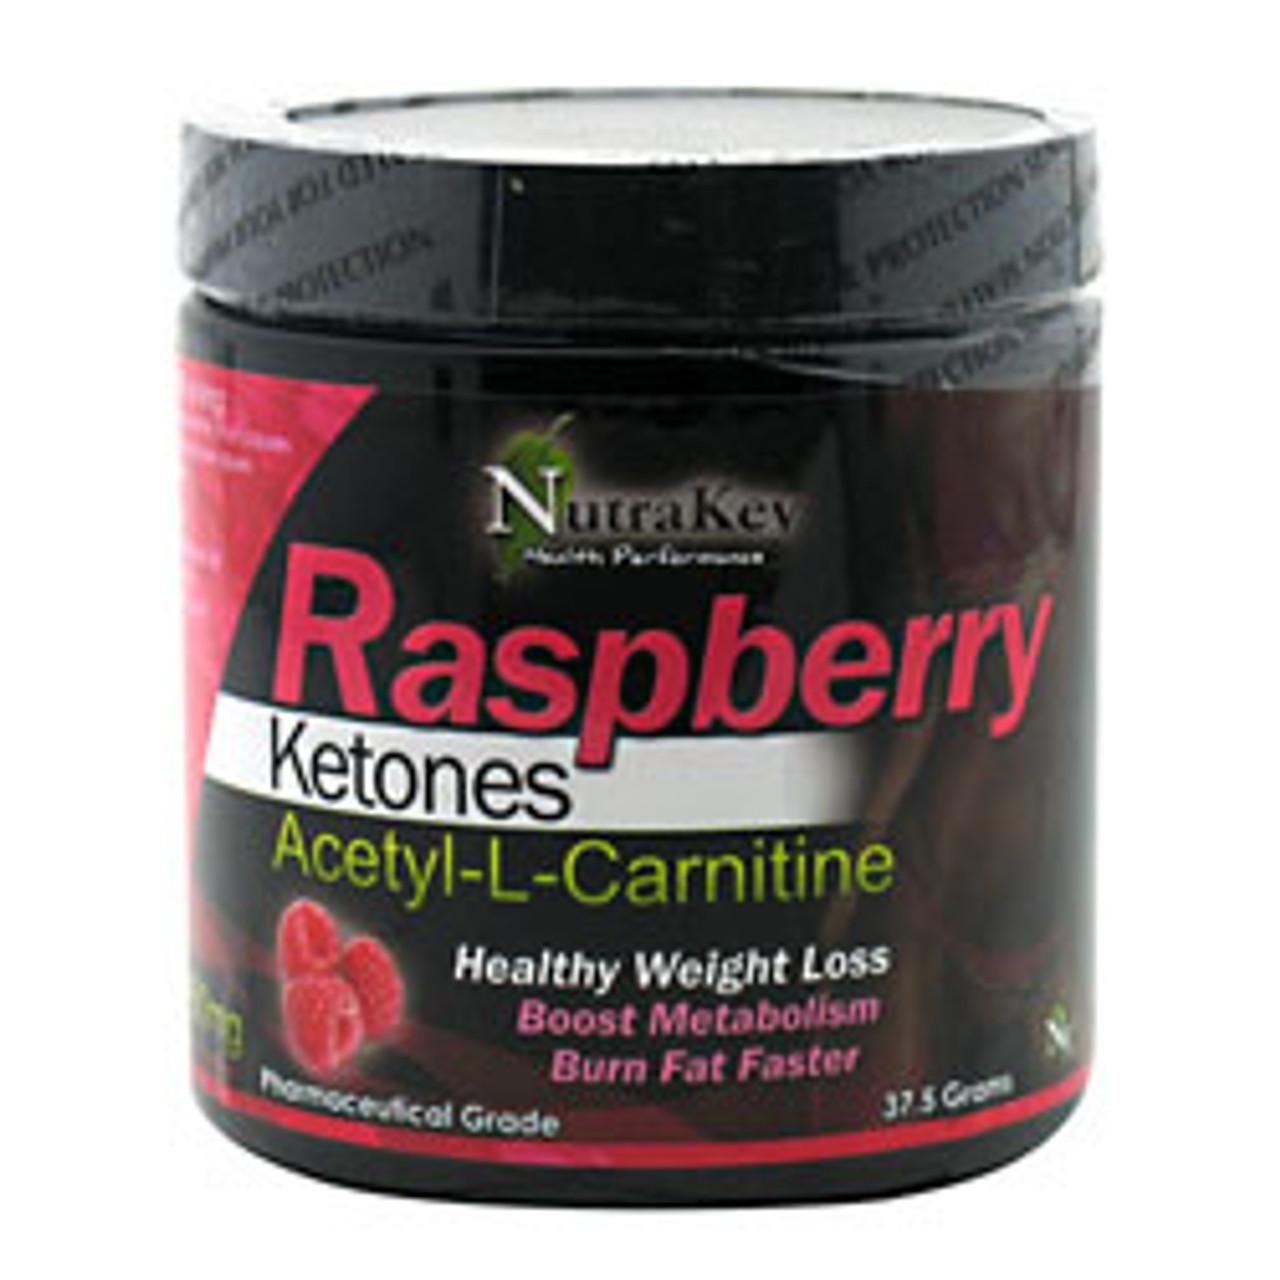 Raspberry Ketones Acetyl-L-Carnitine 37.5g Nutrakey